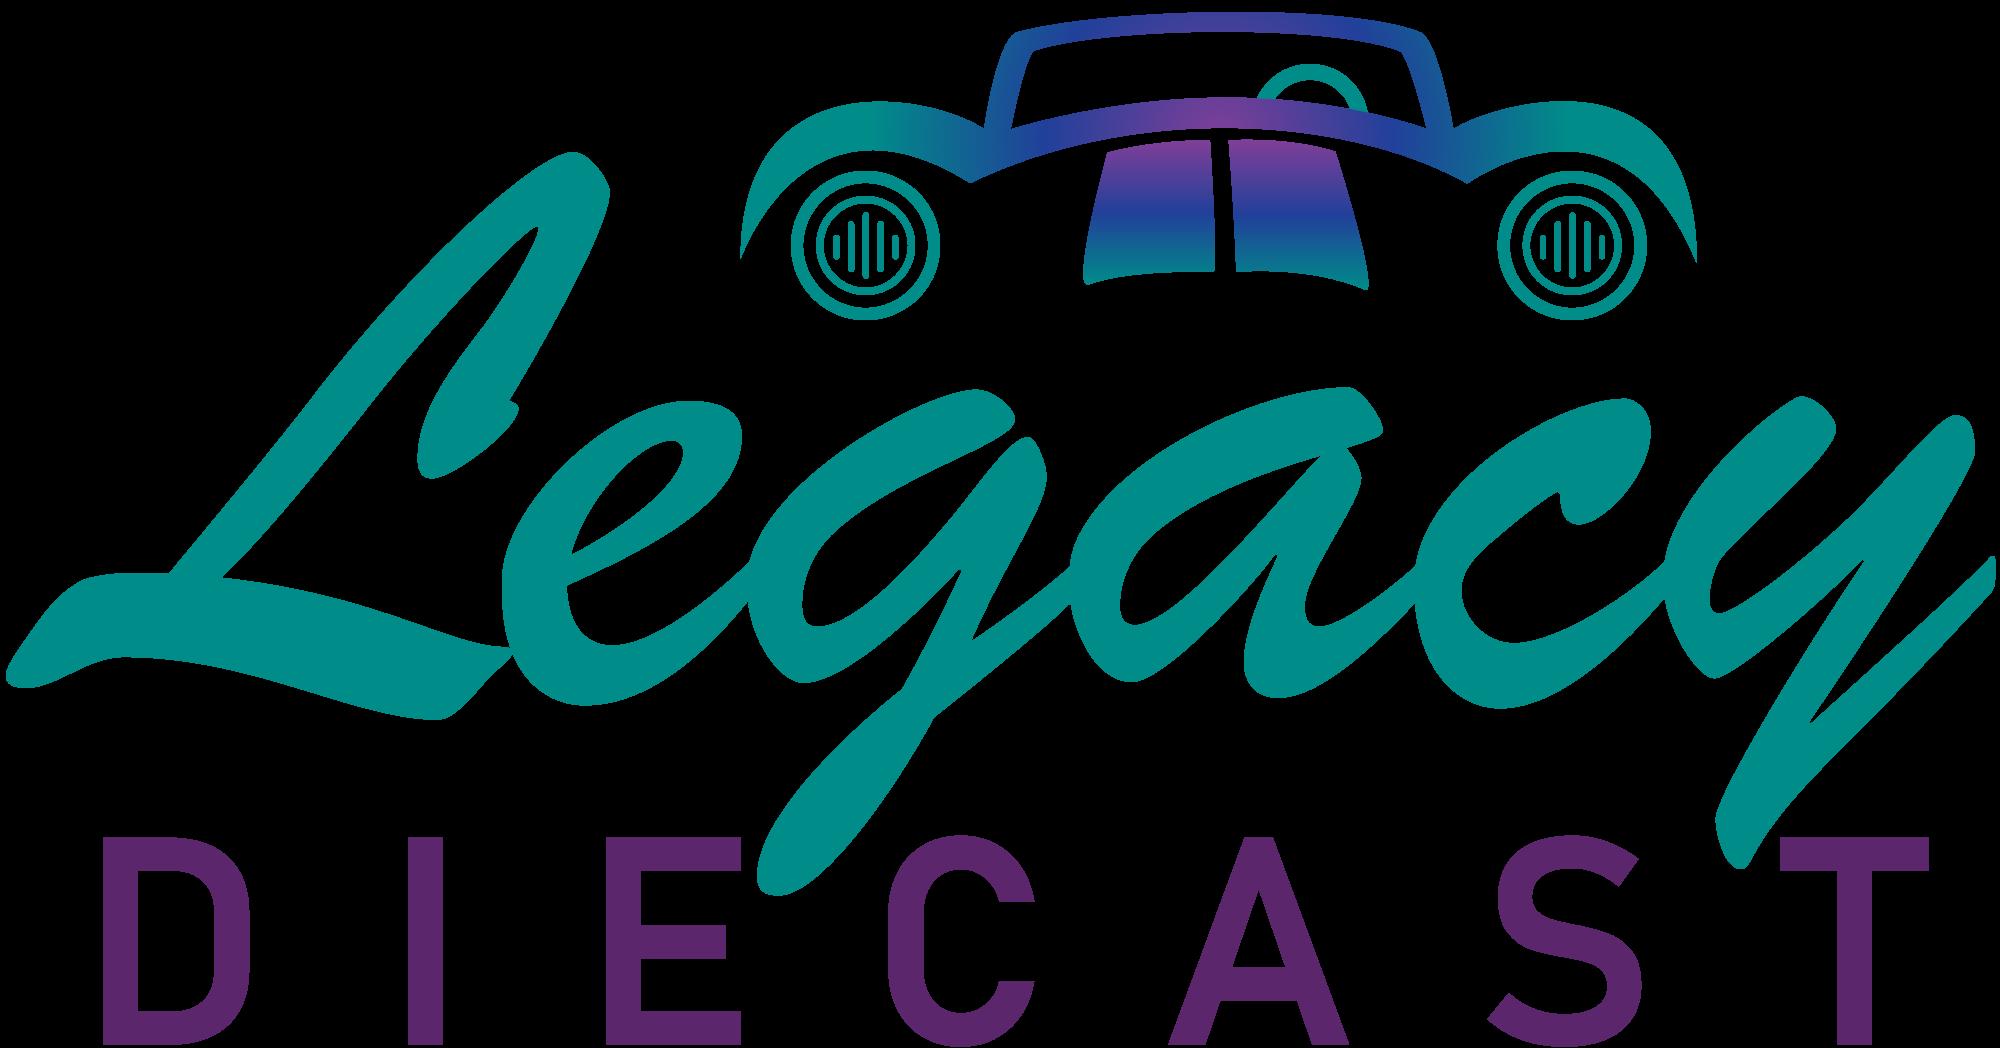 Legacy Diecast